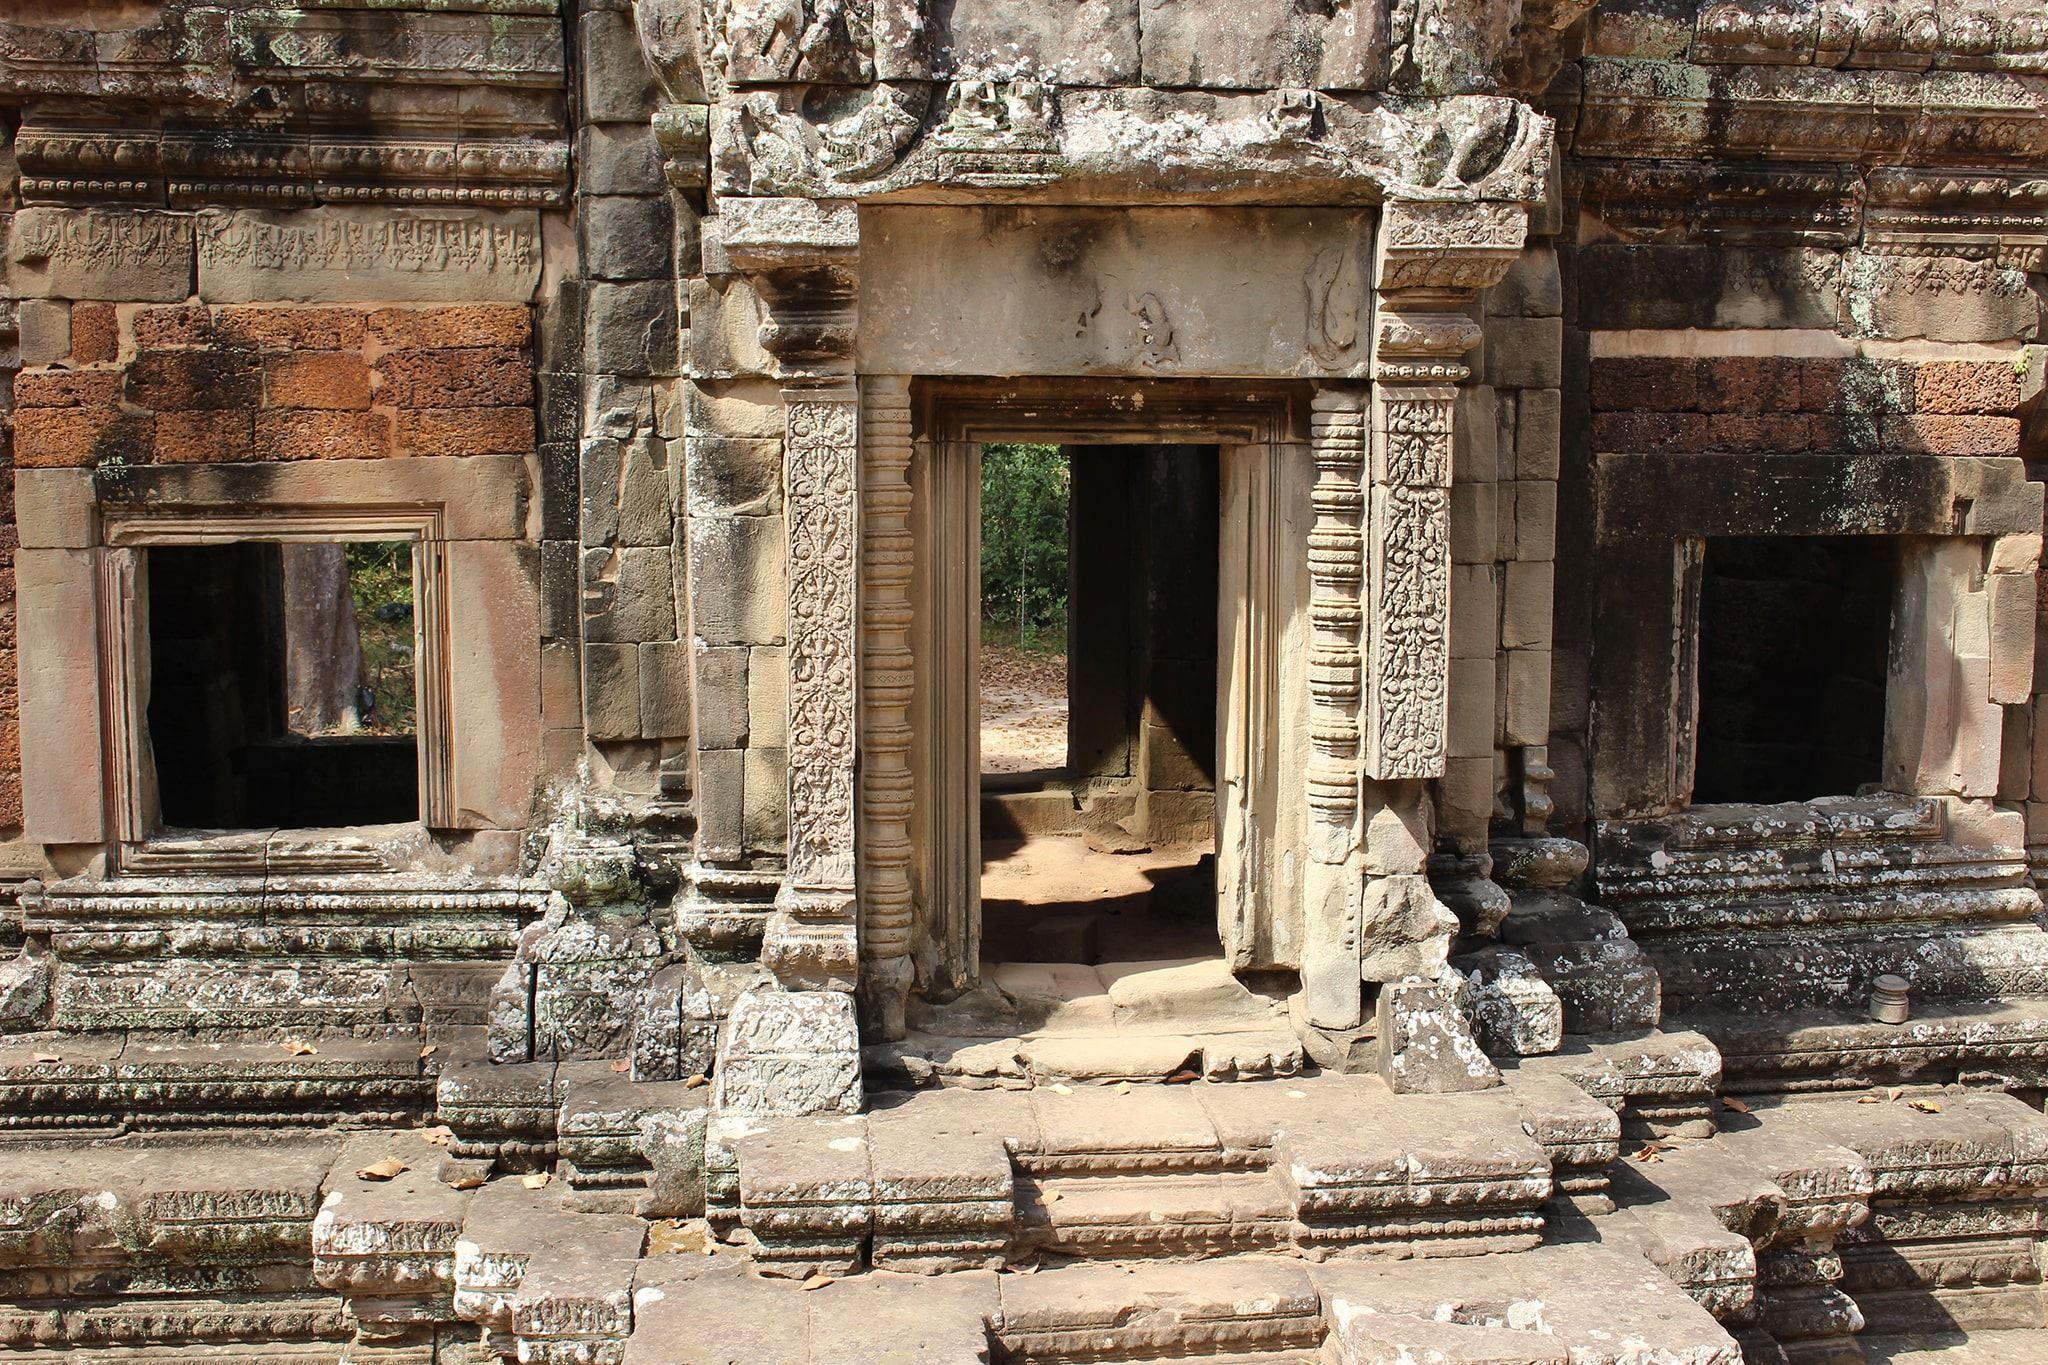 Chau Sey Thevoda